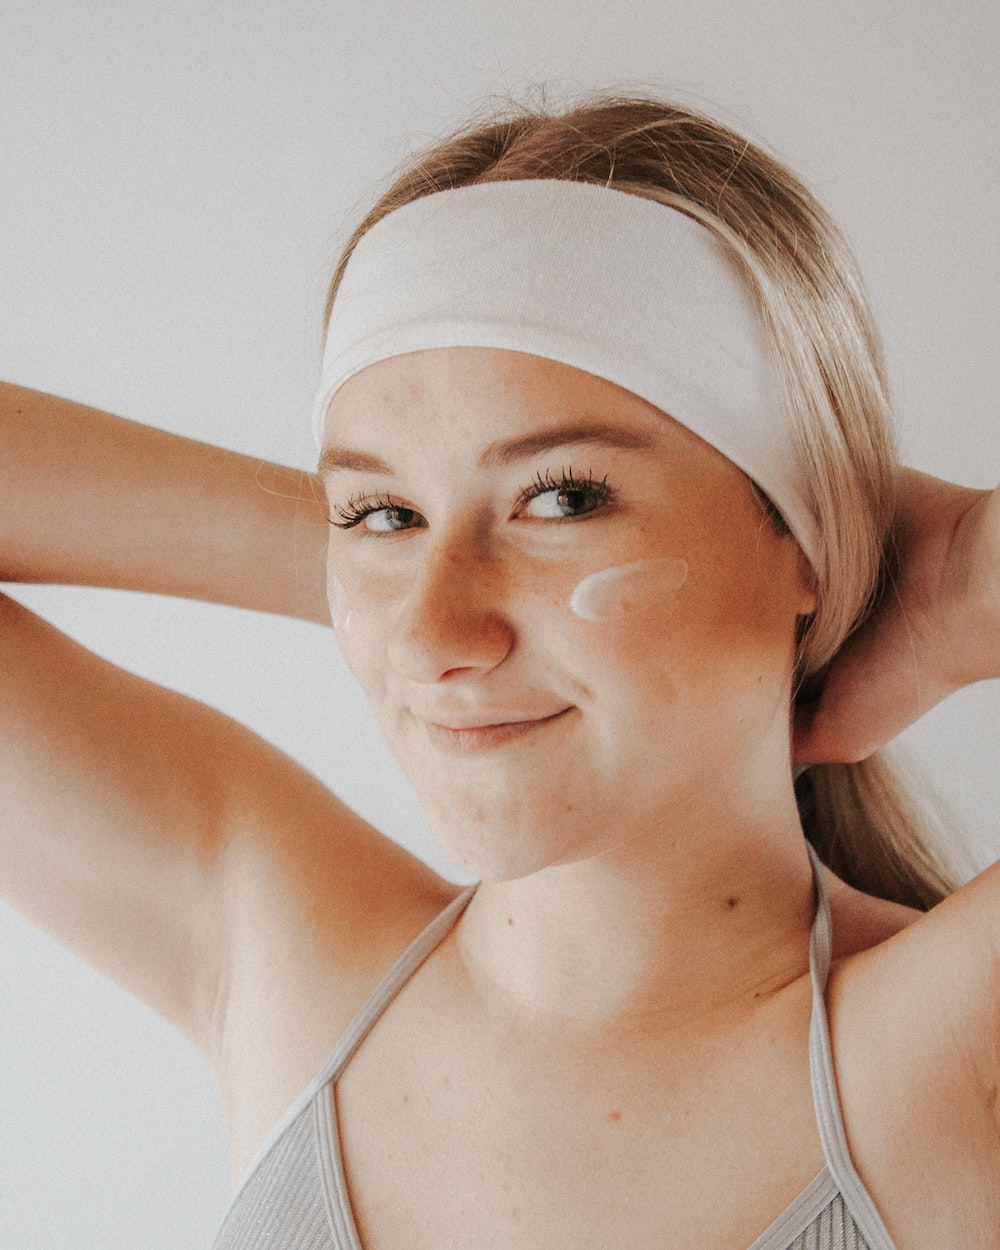 DIY skincare treatments